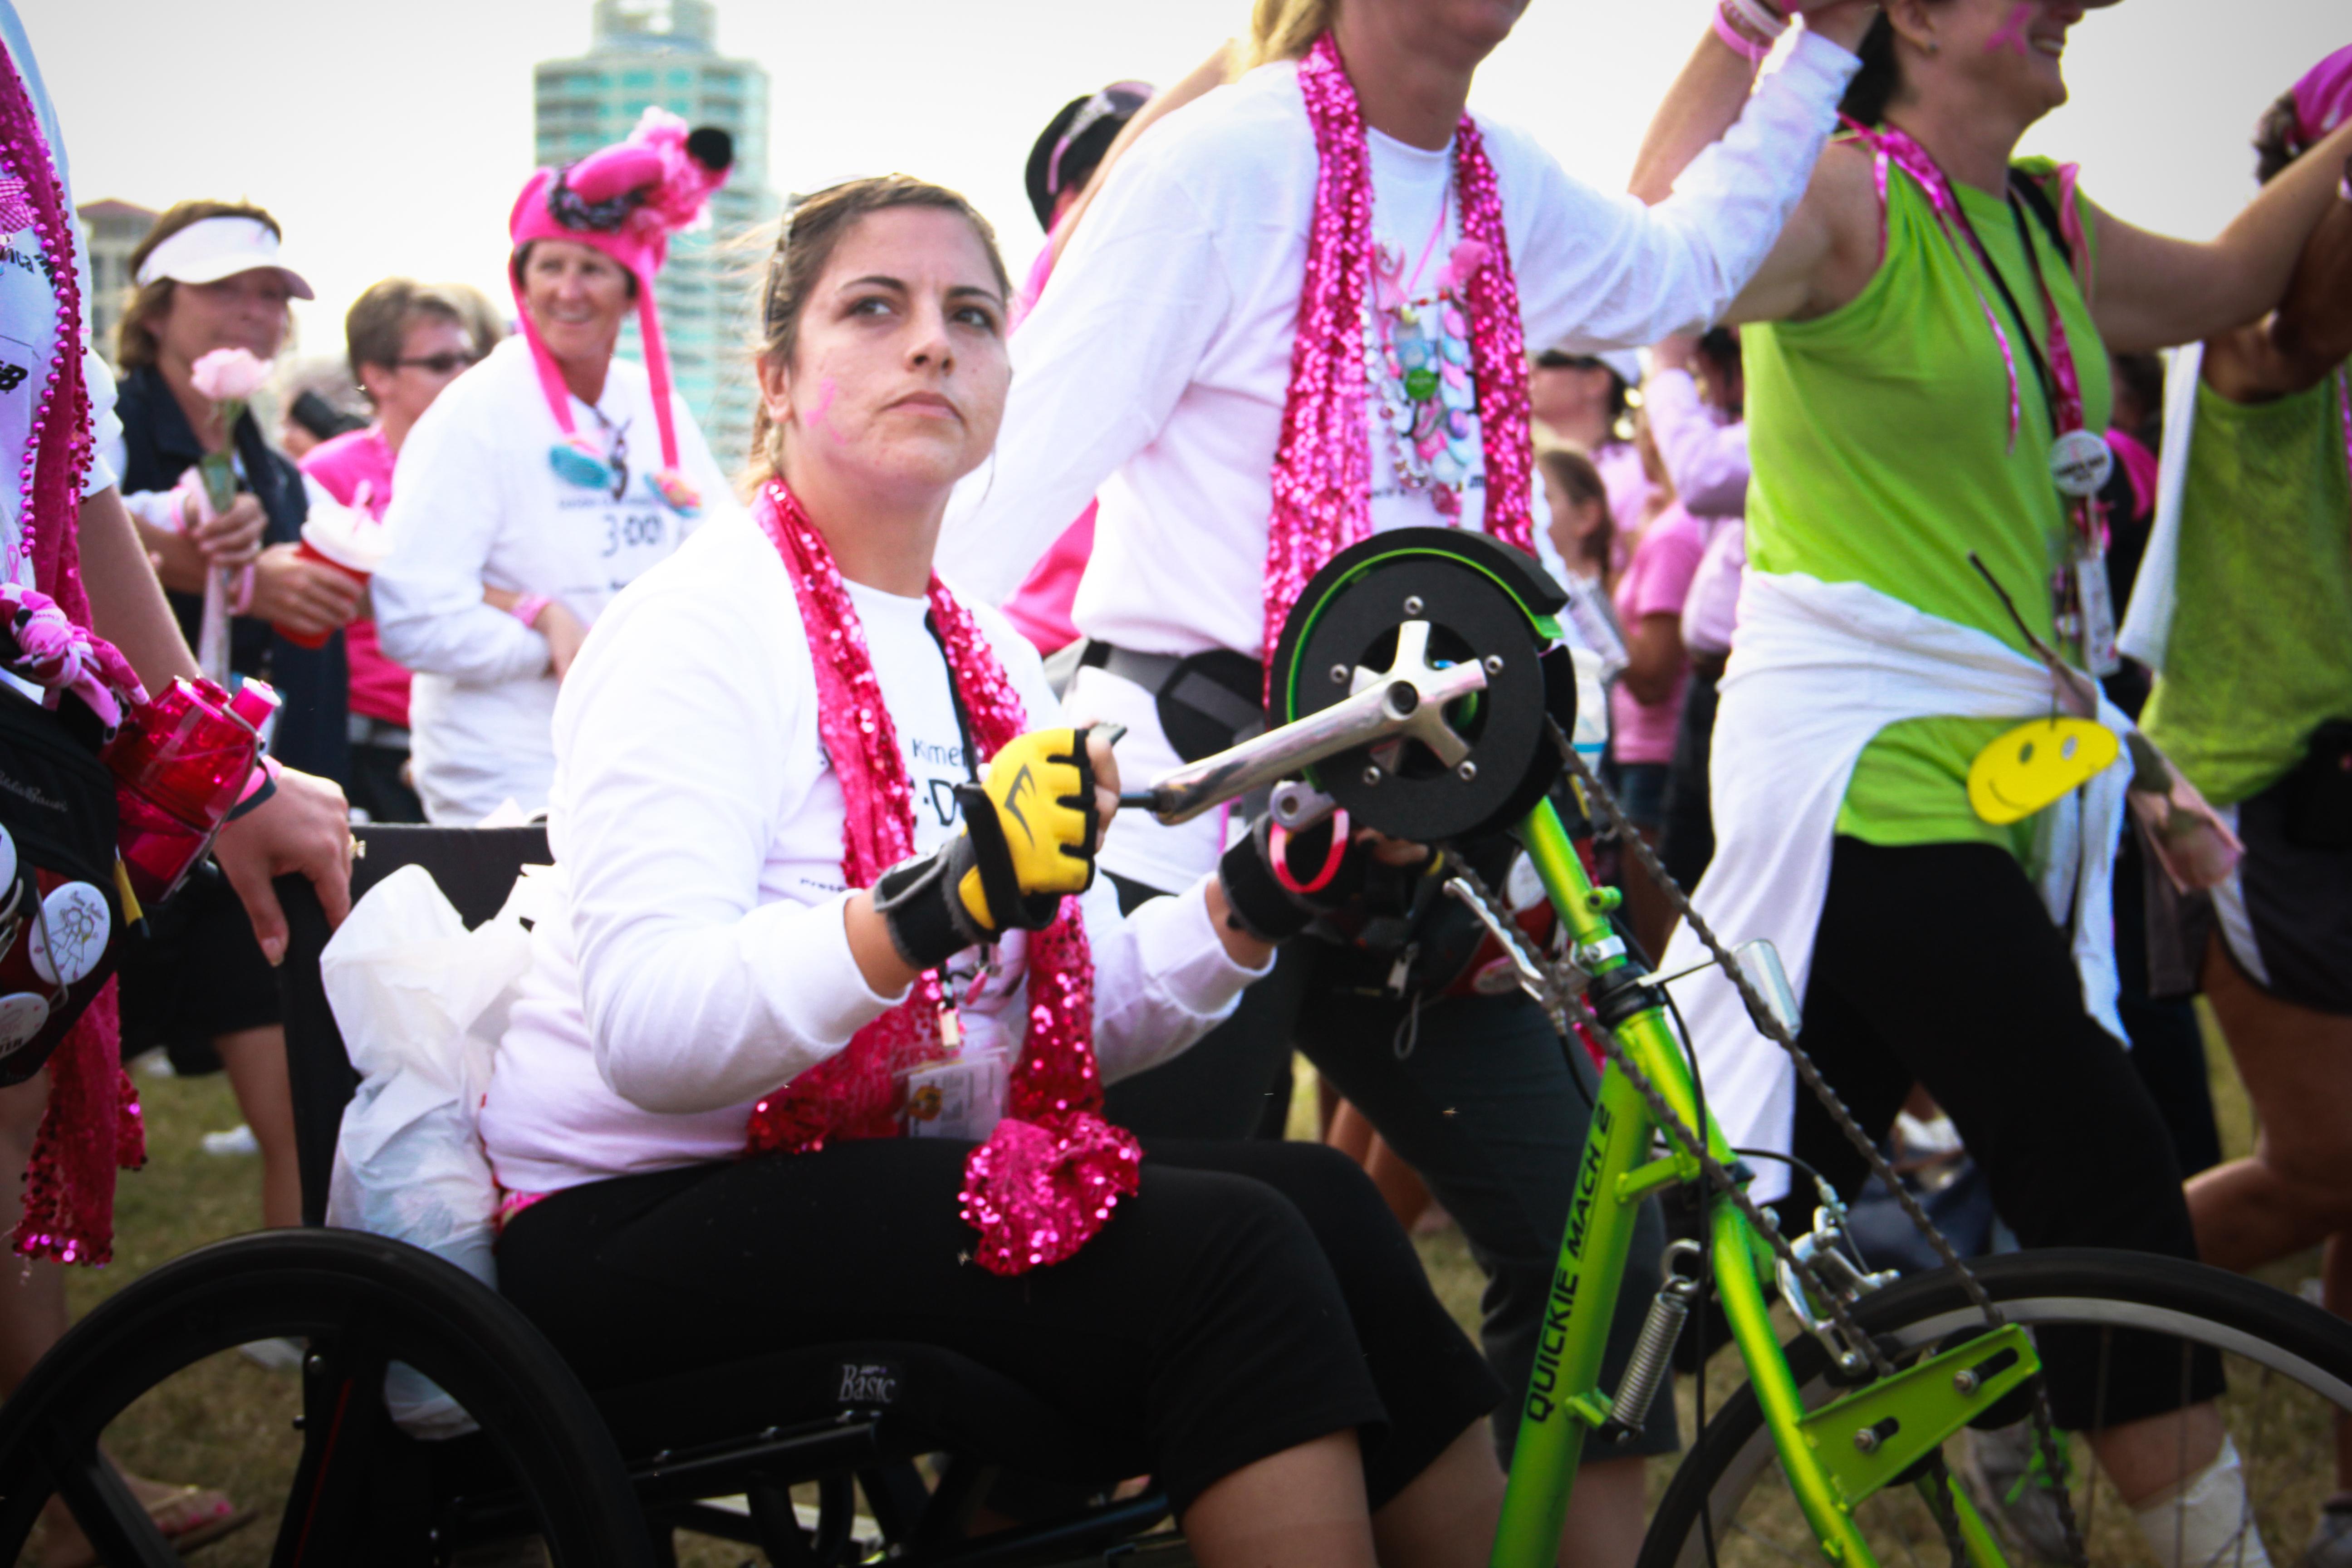 Susan G. Komen Breast Cancer 3-Day Walk